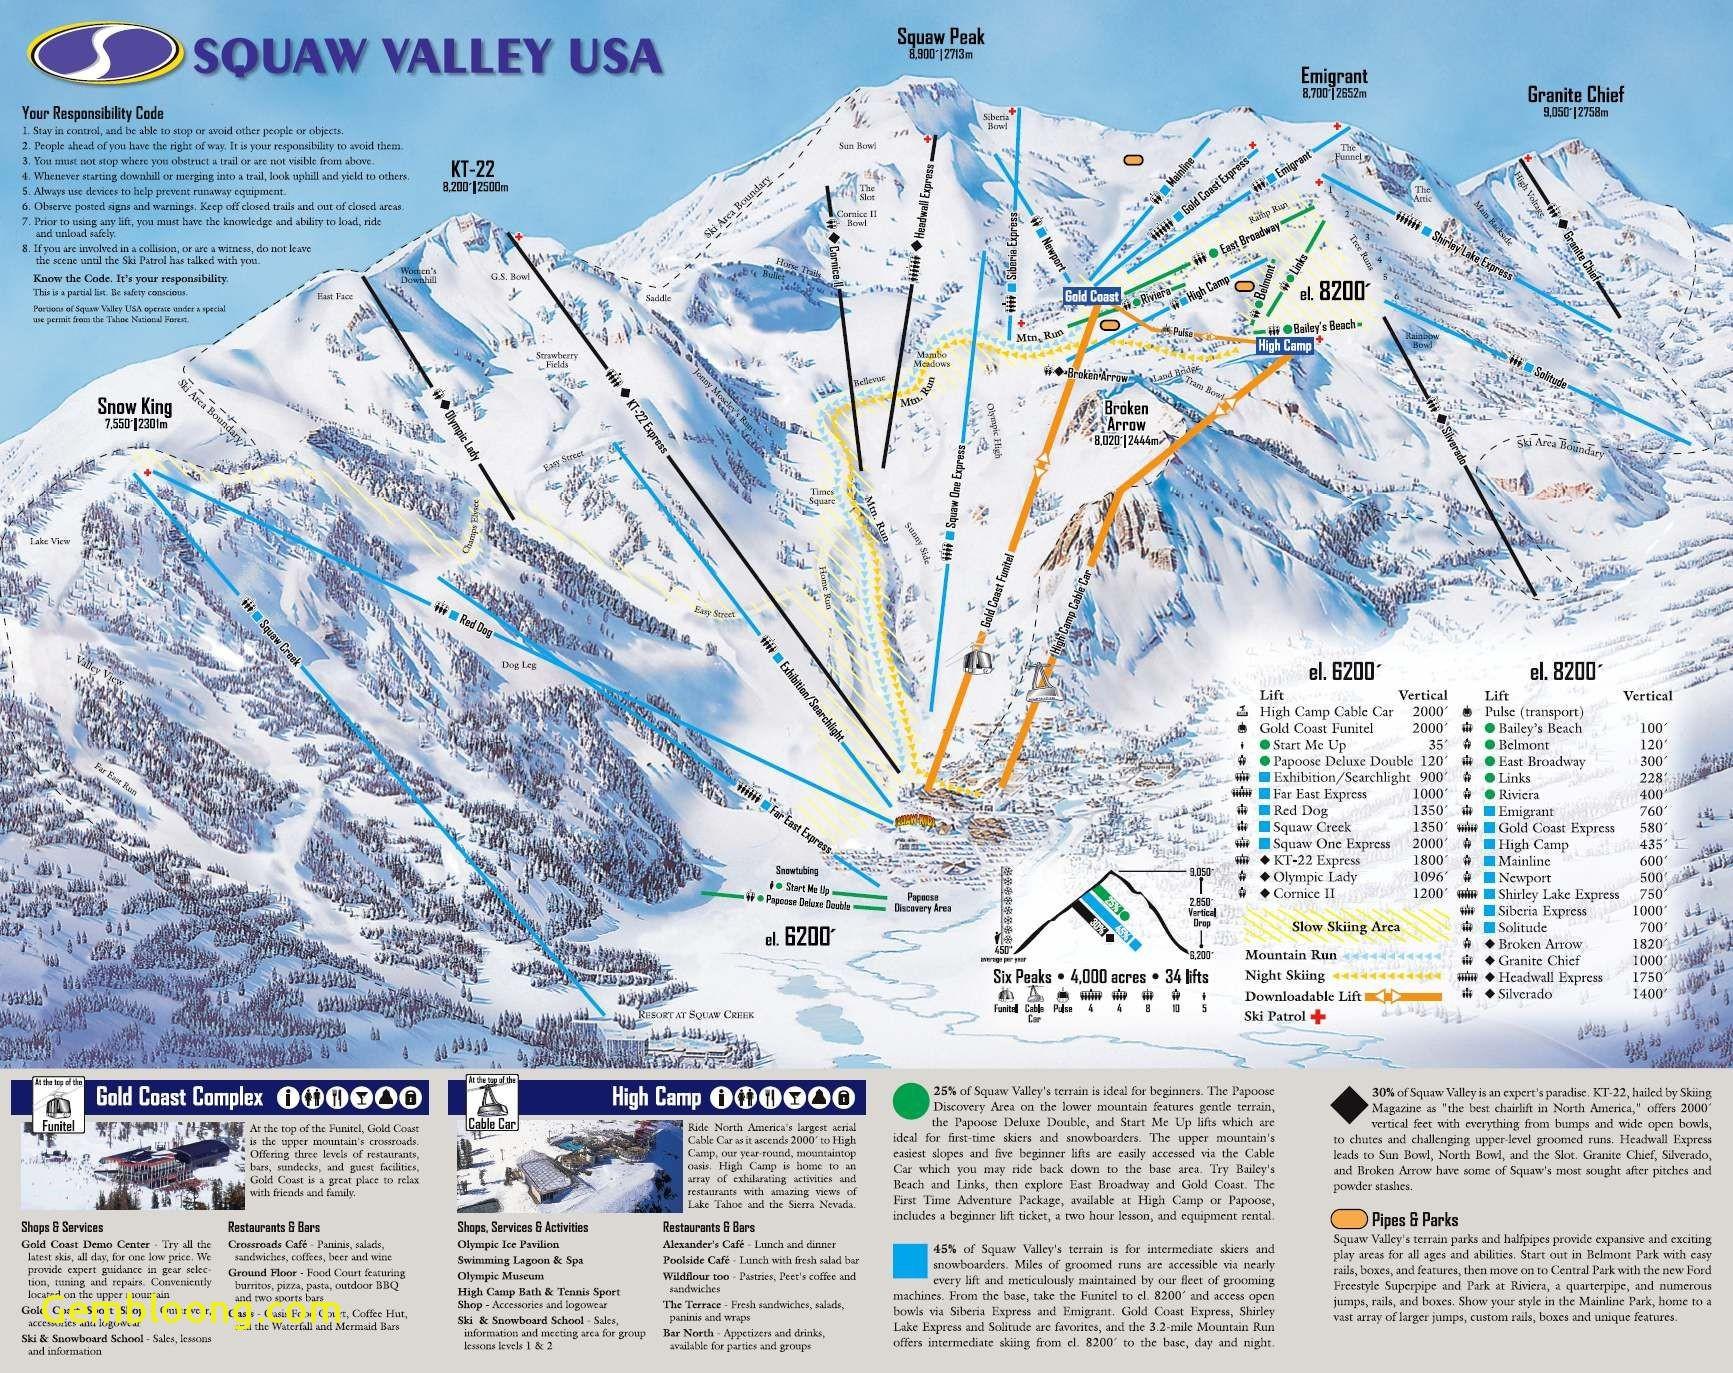 Us East Coast Ski Resorts Map New Southern California Ski Resorts - Southern California Ski Resorts Map